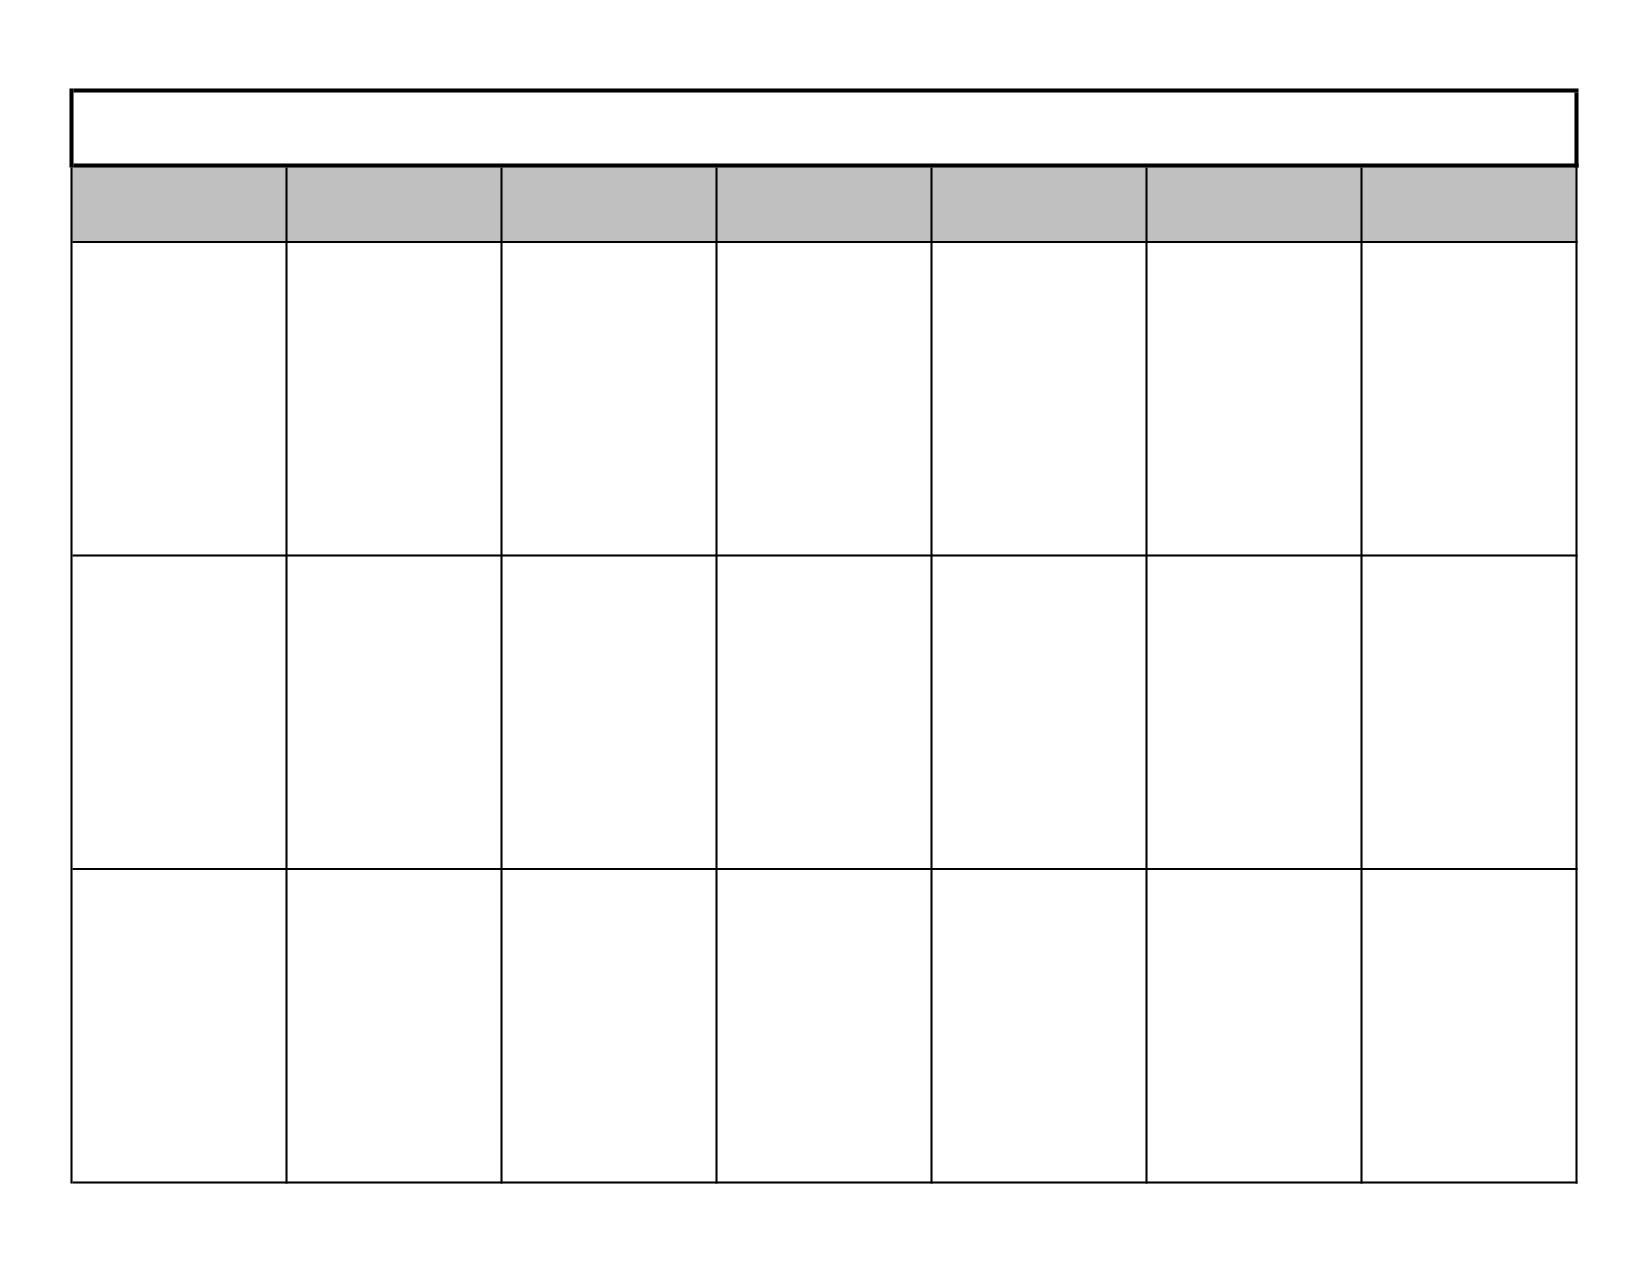 16 Blank Printable Weekly Calendars Templates Images - Blank intended for Blank Printable Weekly Calendar